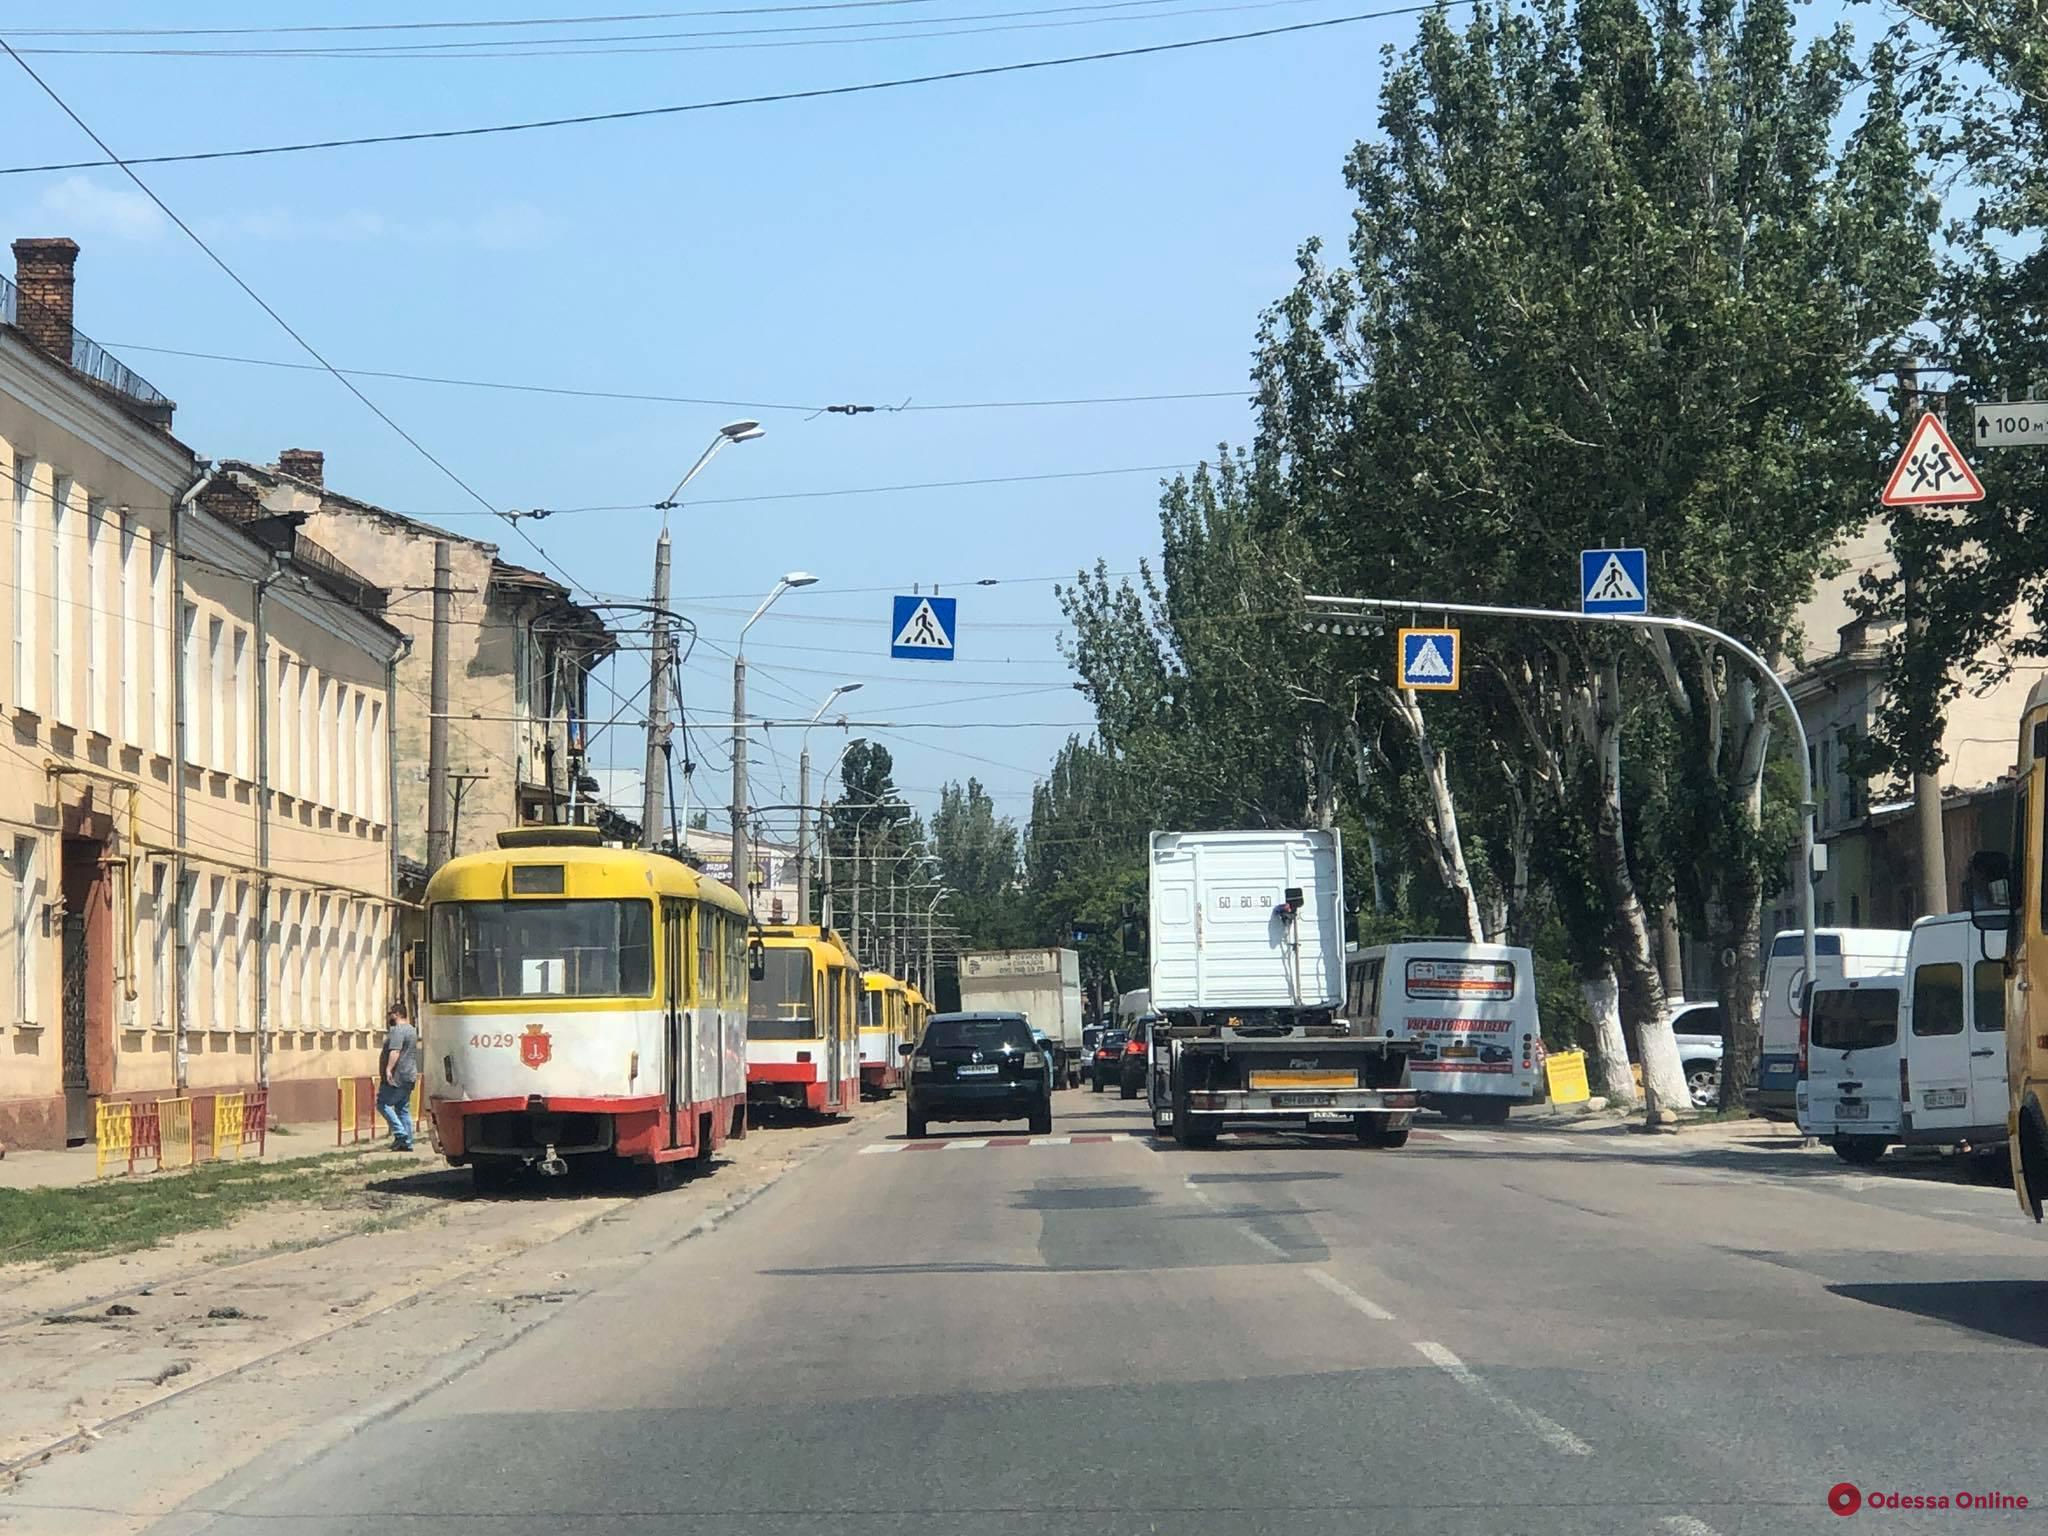 Из-за ДТП на Пересыпи парализовано движение трамваев